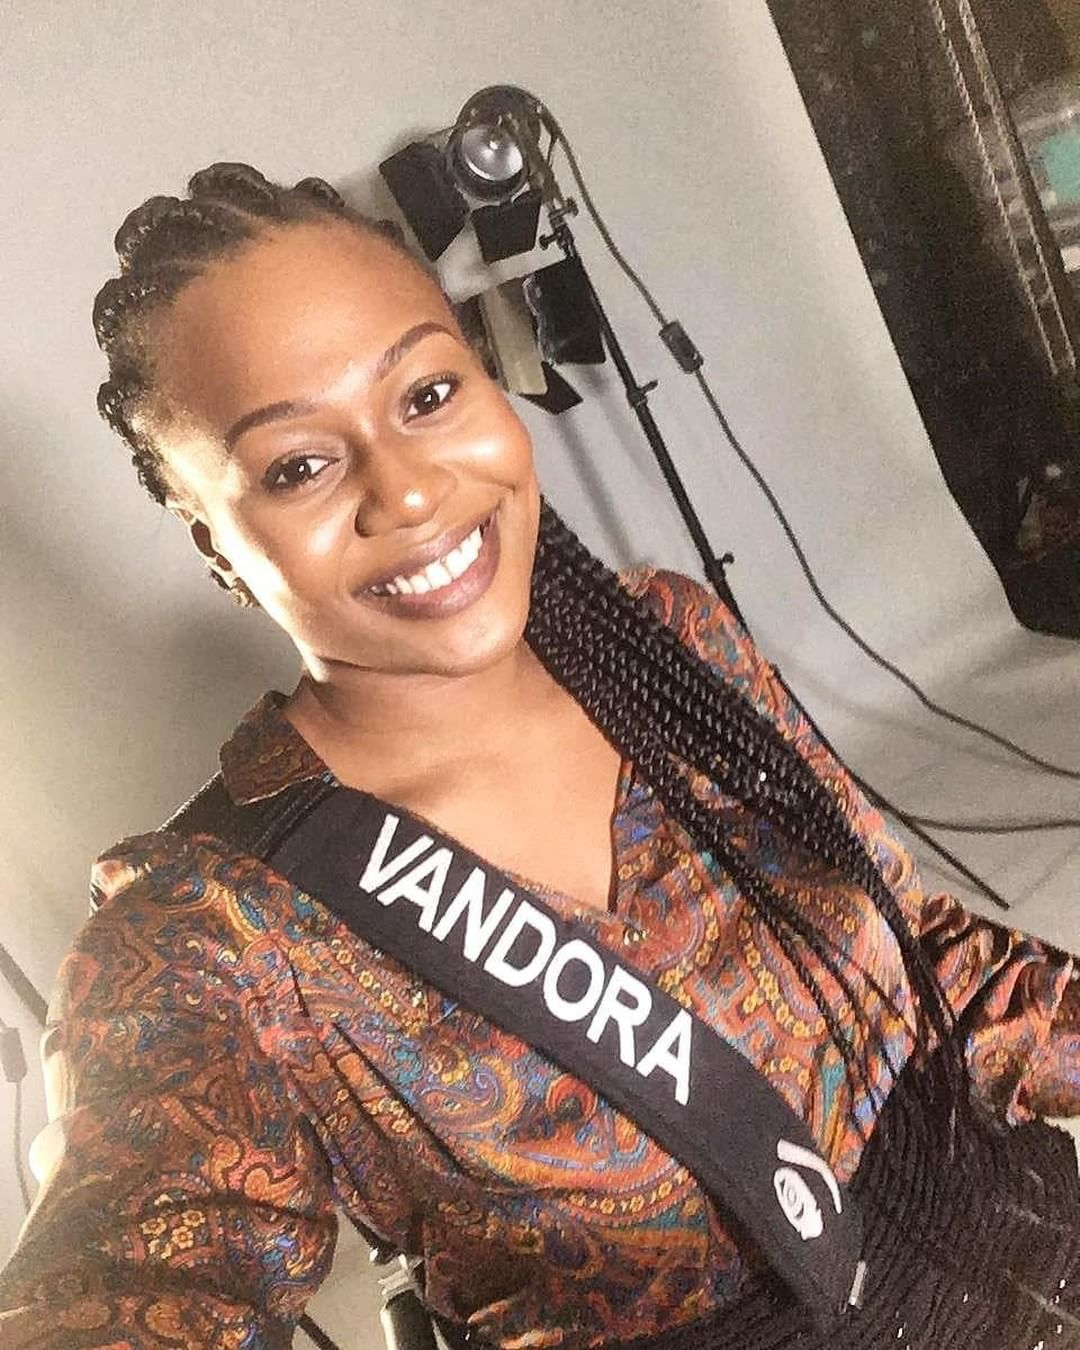 BamBam snitching on me after our Girl Talk was Ridiculous - #BBNaija's Vandora